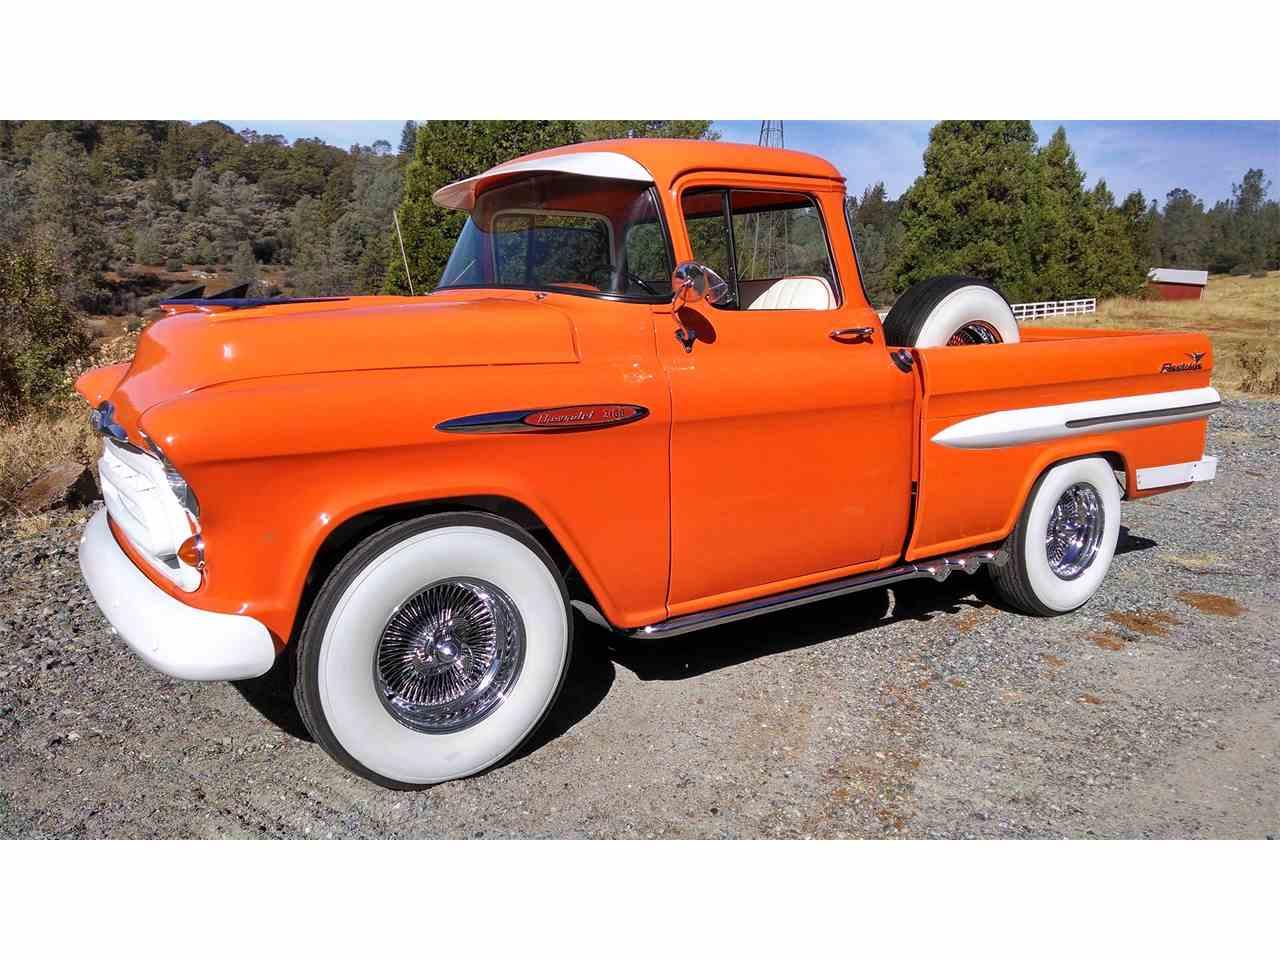 Large Picture of '58 Chevrolet Fleetside Offered by Brockers Beautys - JK3D